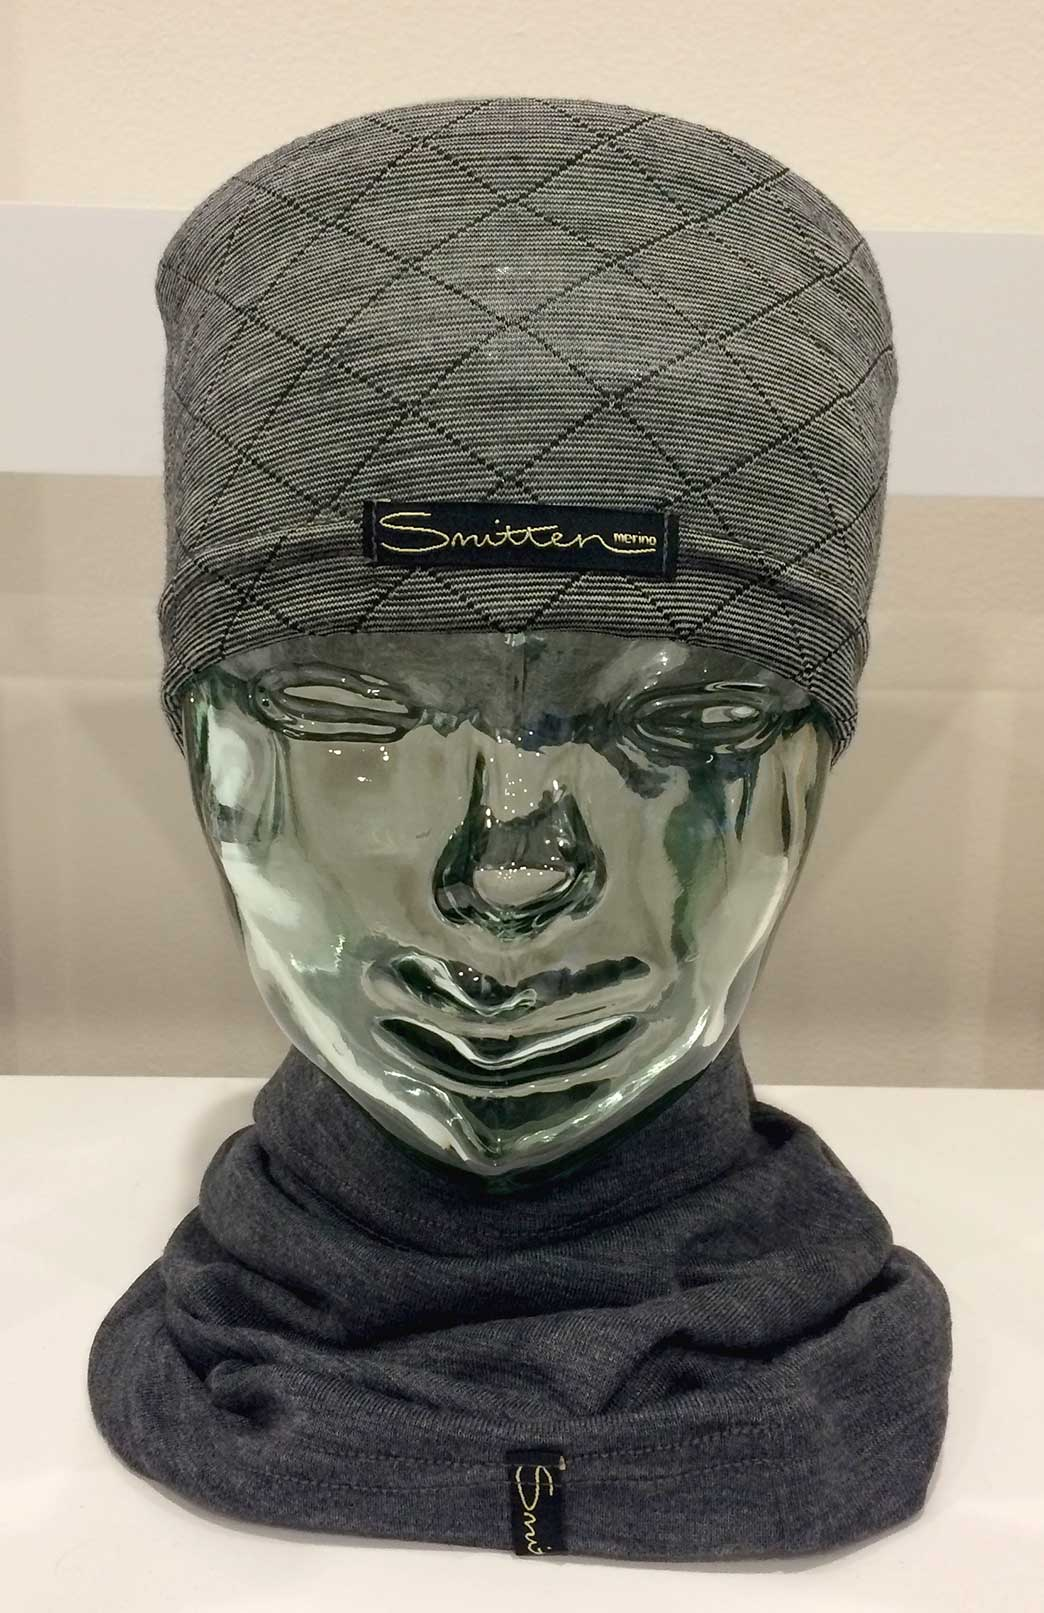 Headband/Earwarmers - Superfine Merino Wool Thermal Fashion Sports Headband - Smitten Merino Tasmania Australia